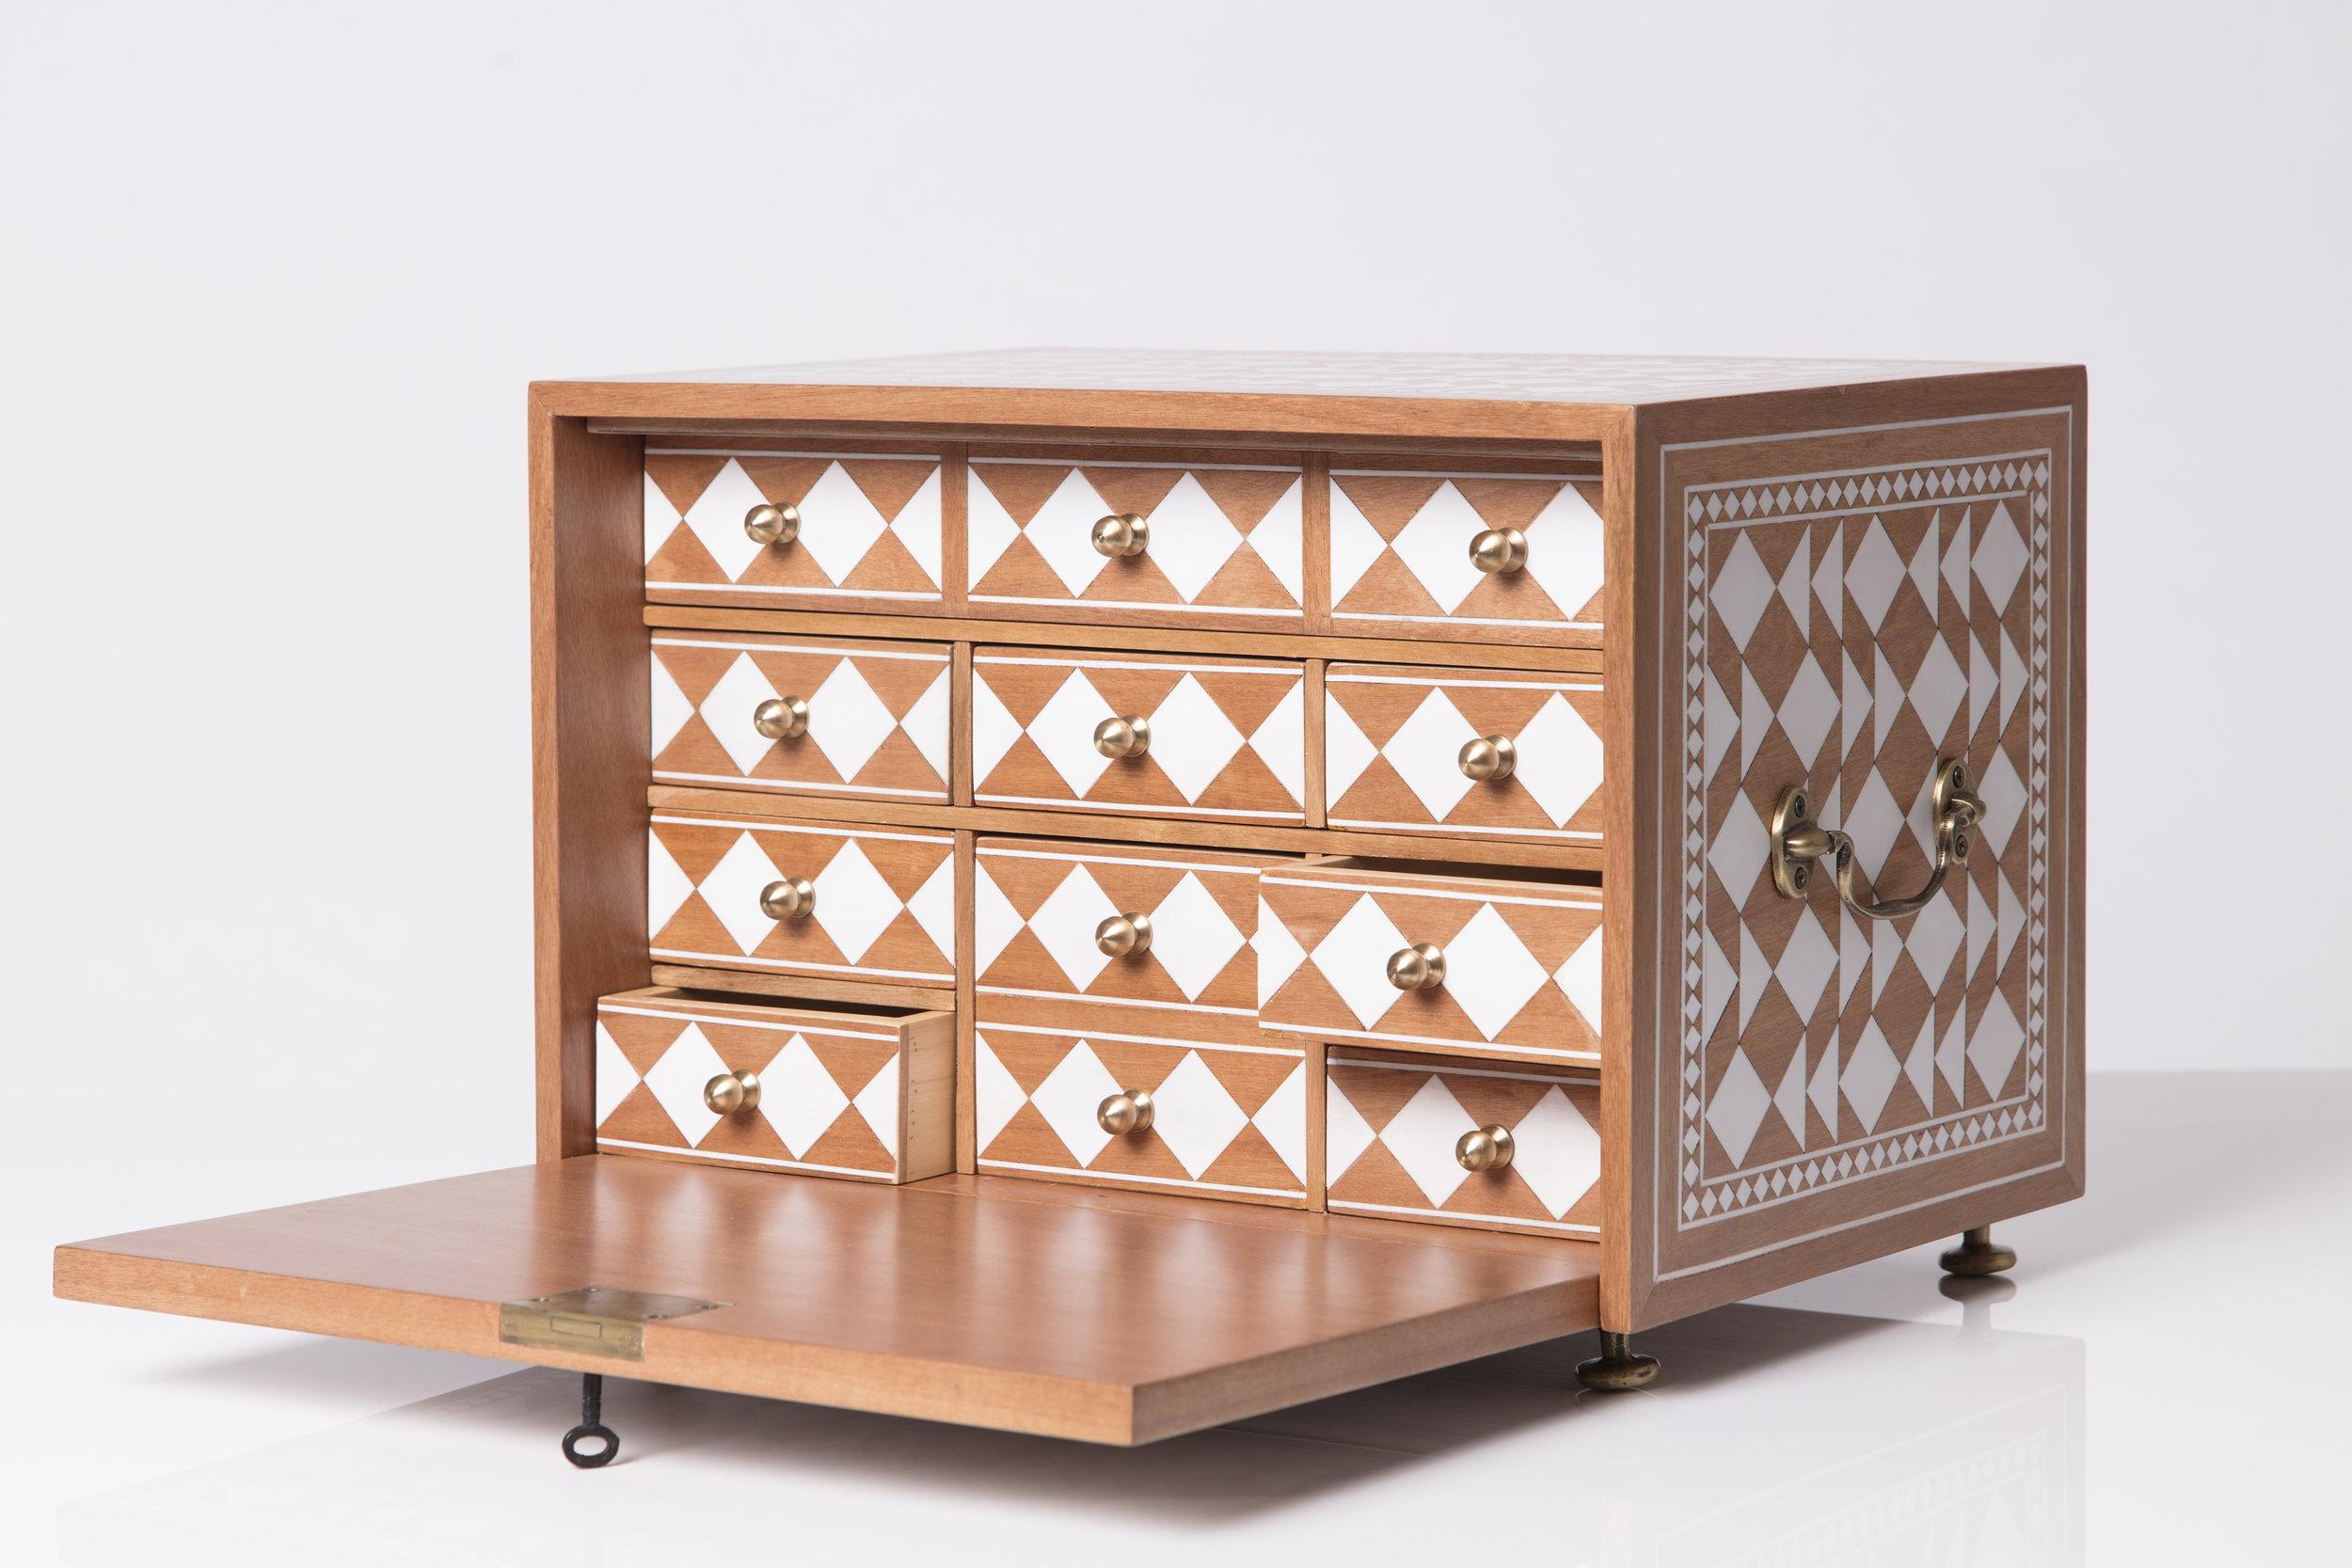 Sibylle Tarazi_Curiosity Cabinets_One and a half_Drawers profile_2017.jpg